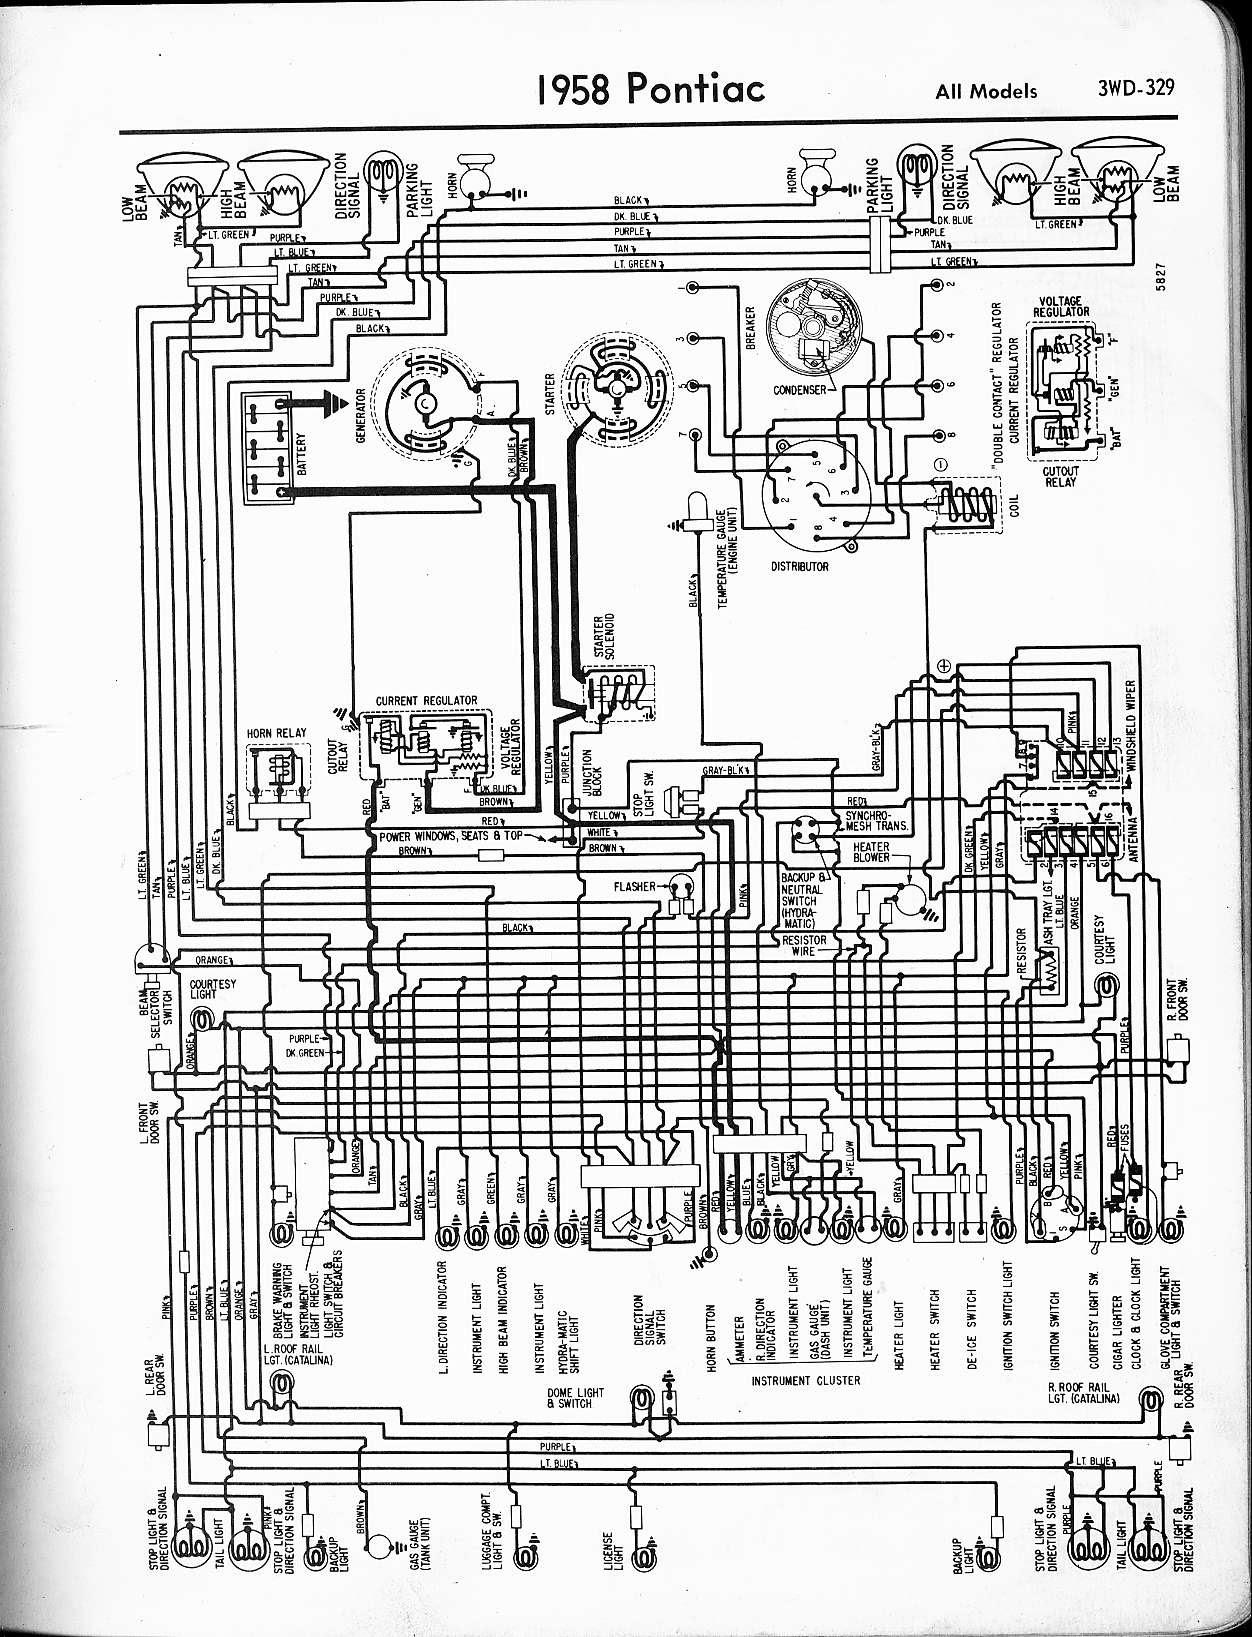 Diagram 1998 Pontiac Bonneville Wiring Diagram Schematic Full Version Hd Quality Diagram Schematic Tripwiringx18 Pergotende Roma It